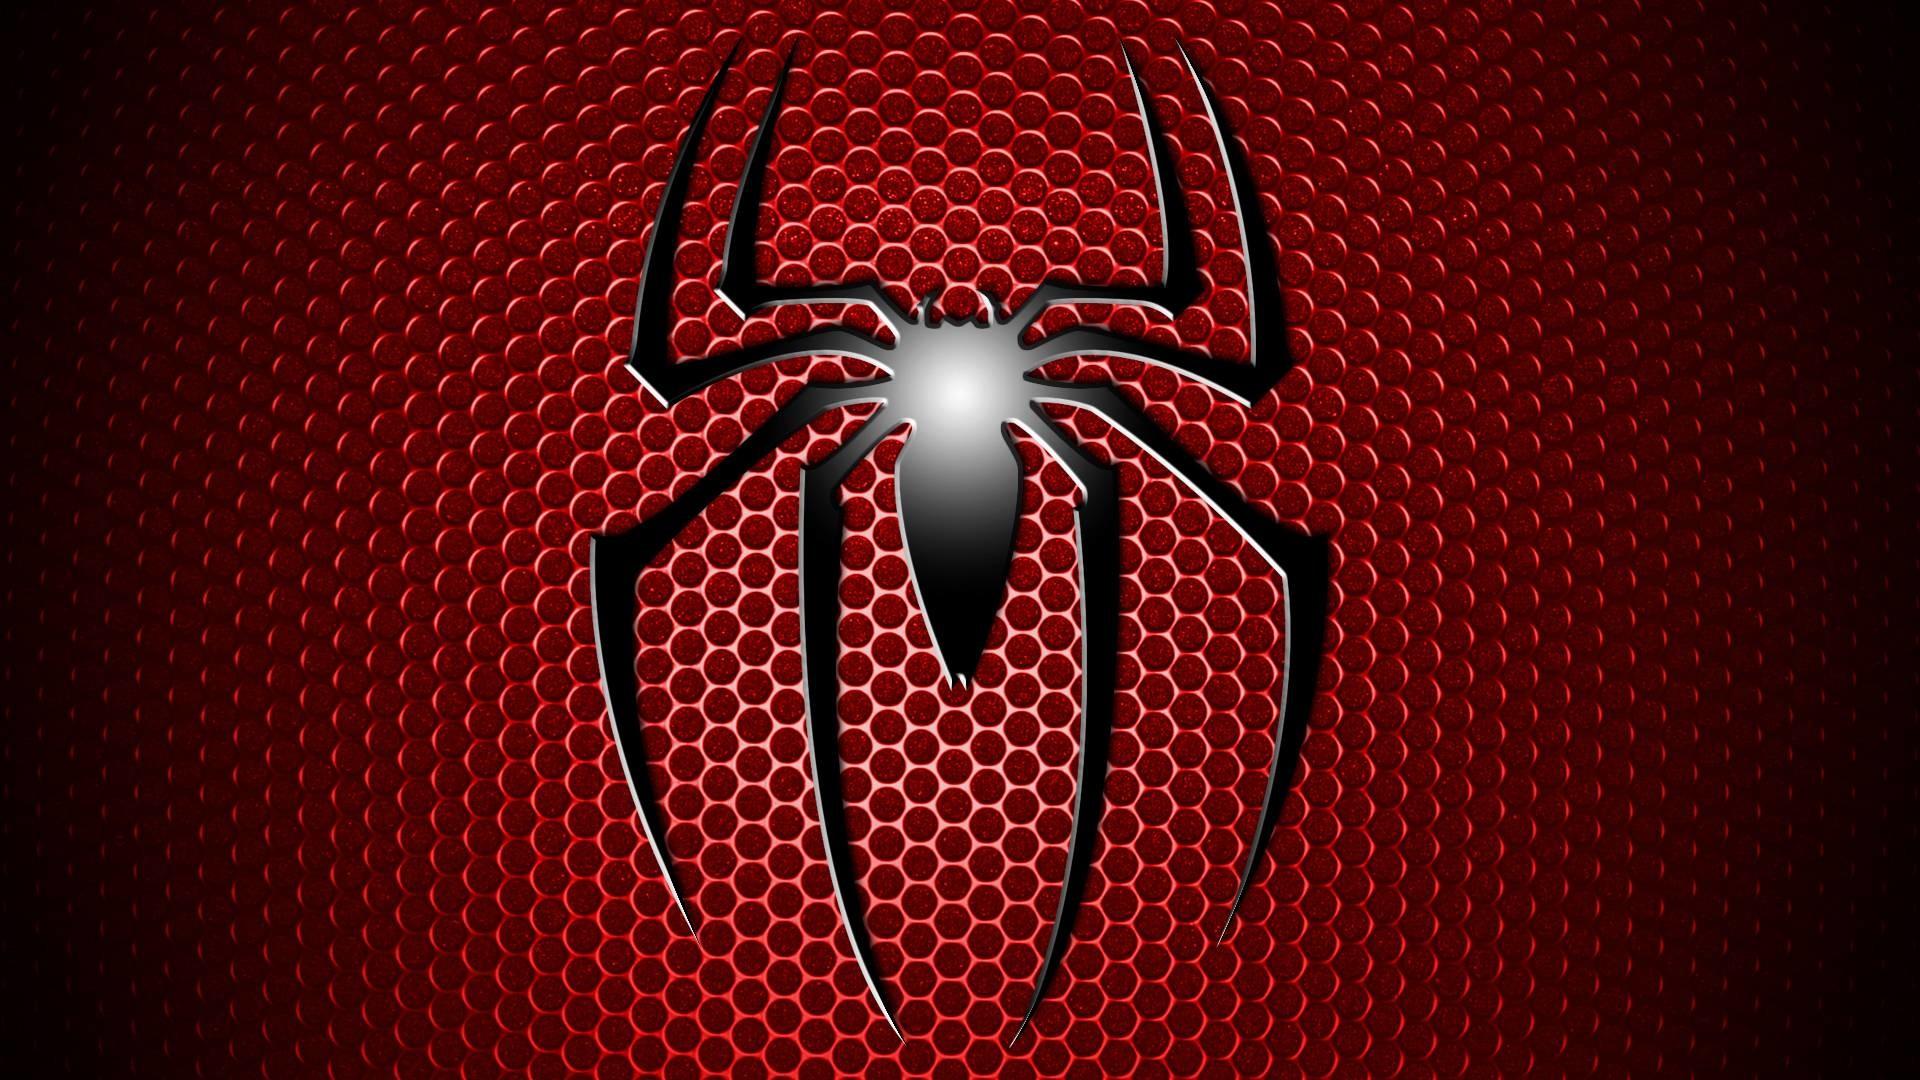 HD Spiderman Logo Wallpaper (71+ images).